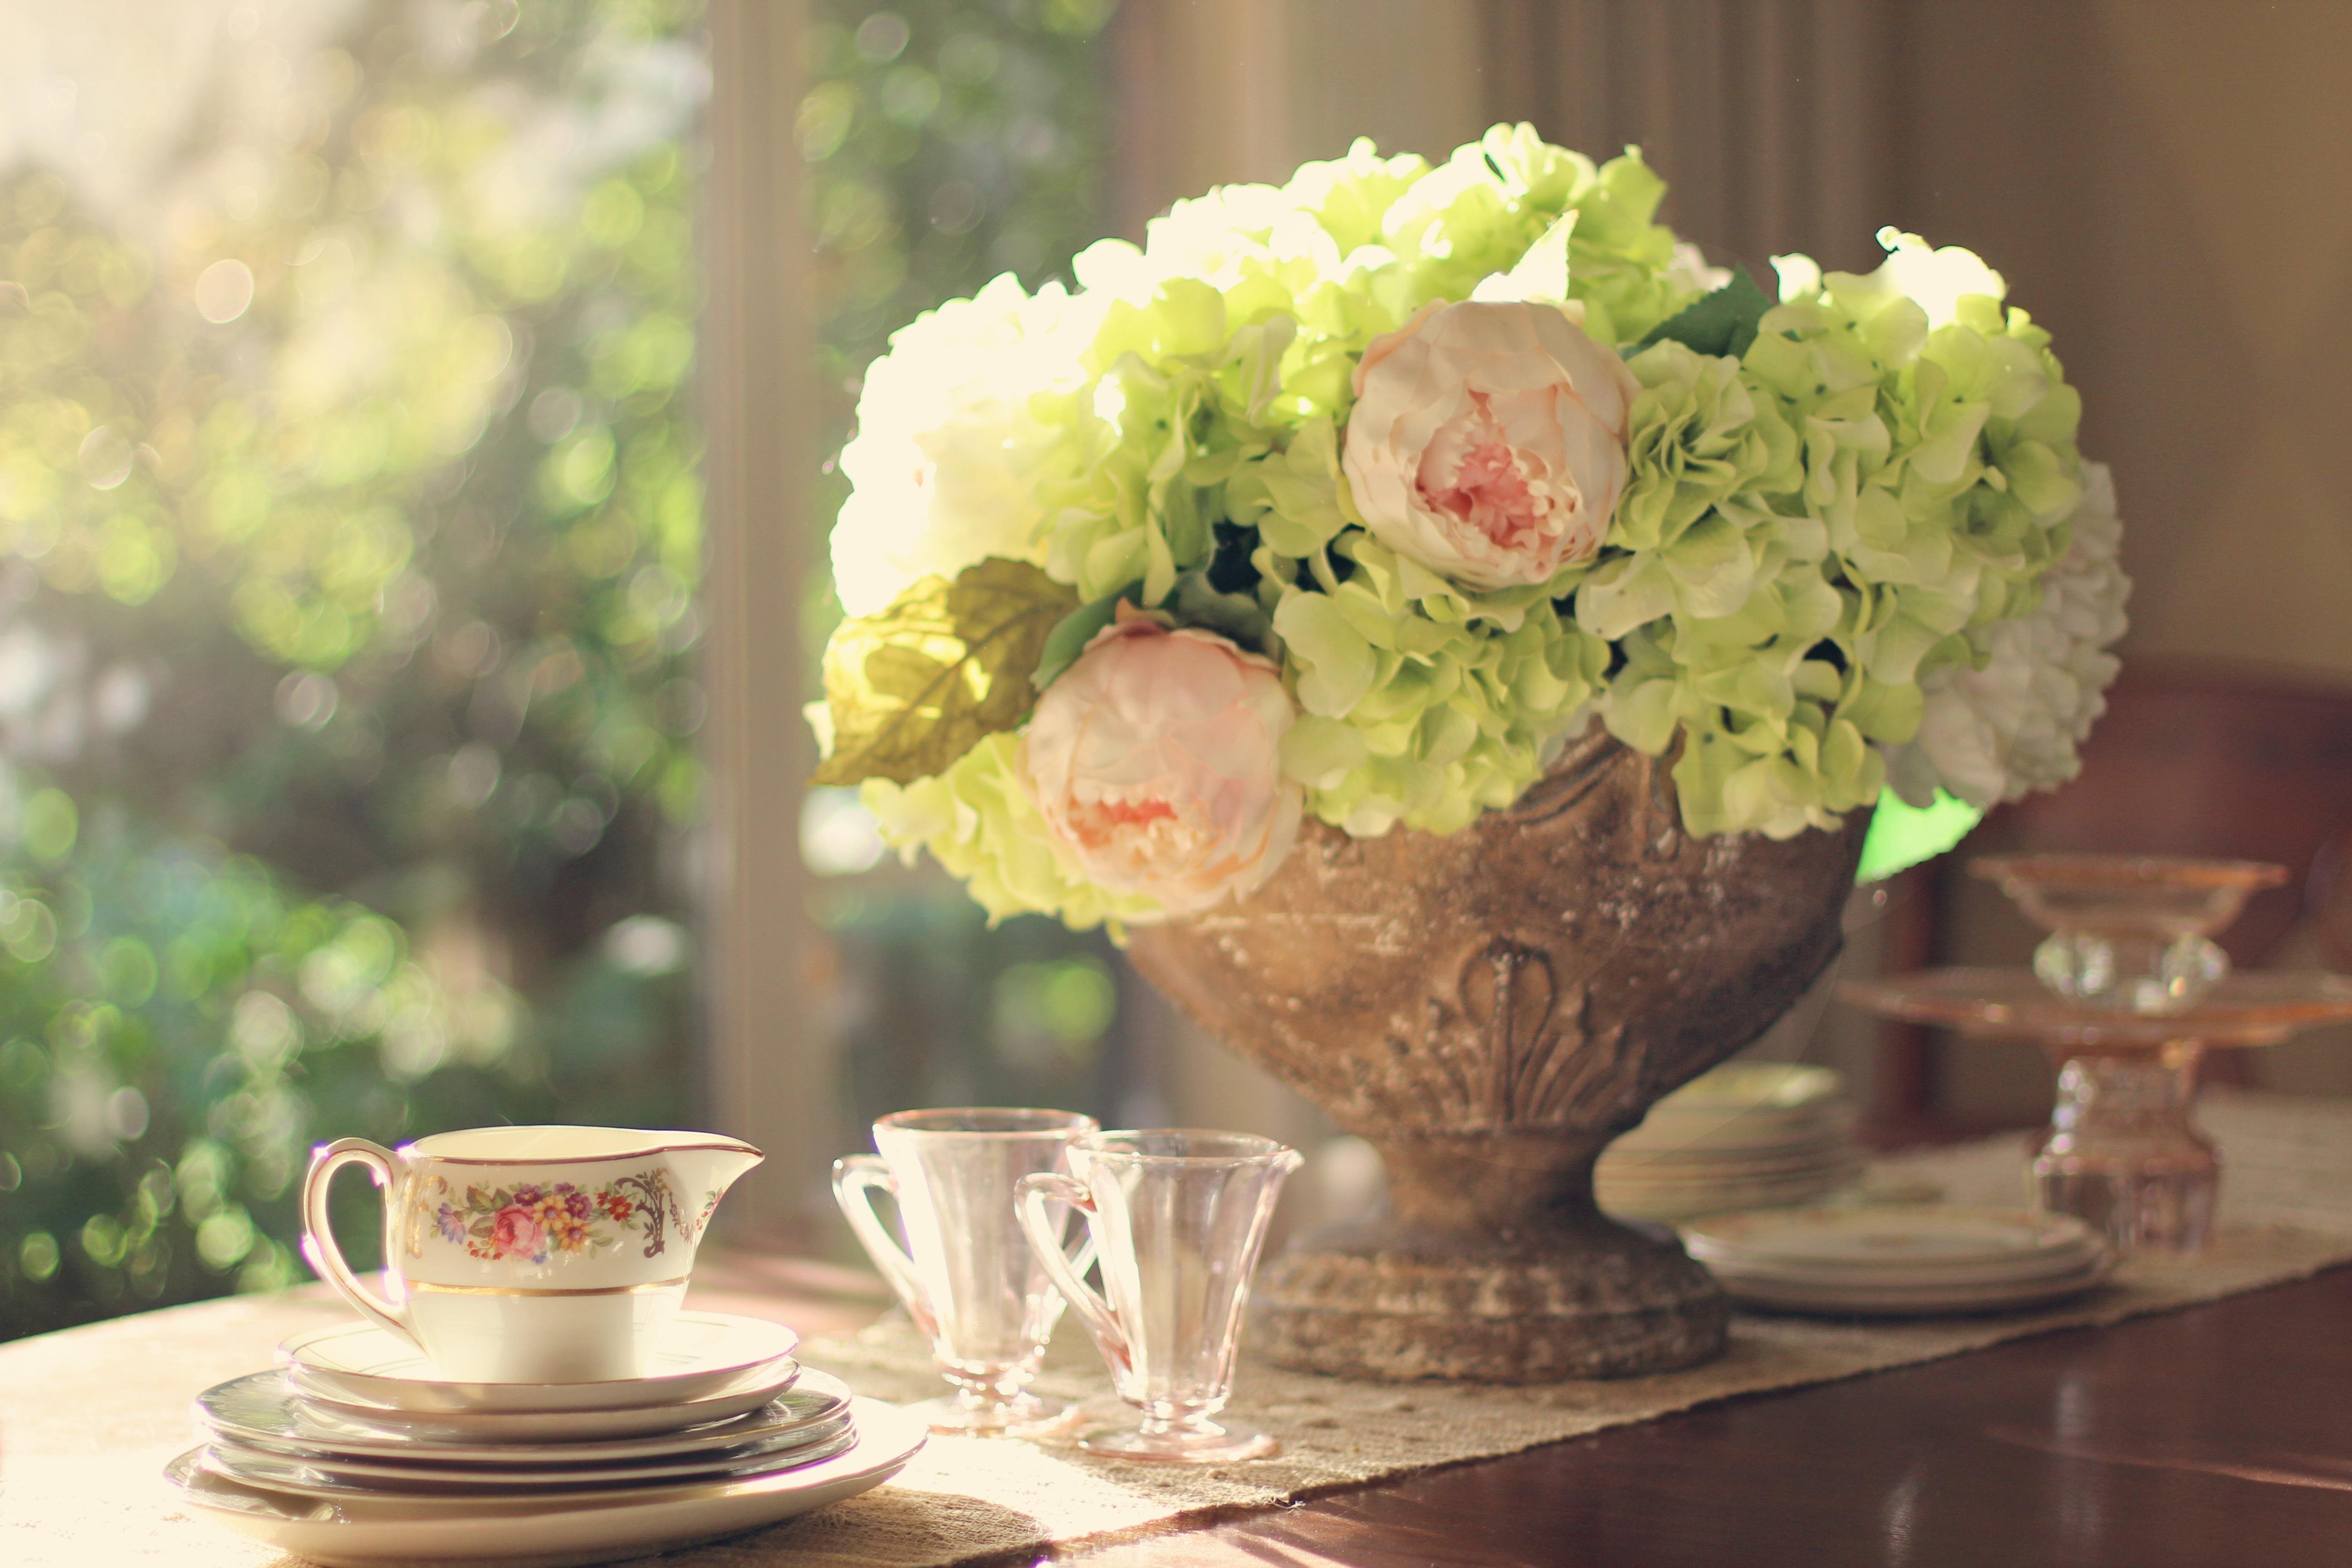 цветы ваза букет посуда flowers vase bouquet dishes  № 1733898 загрузить